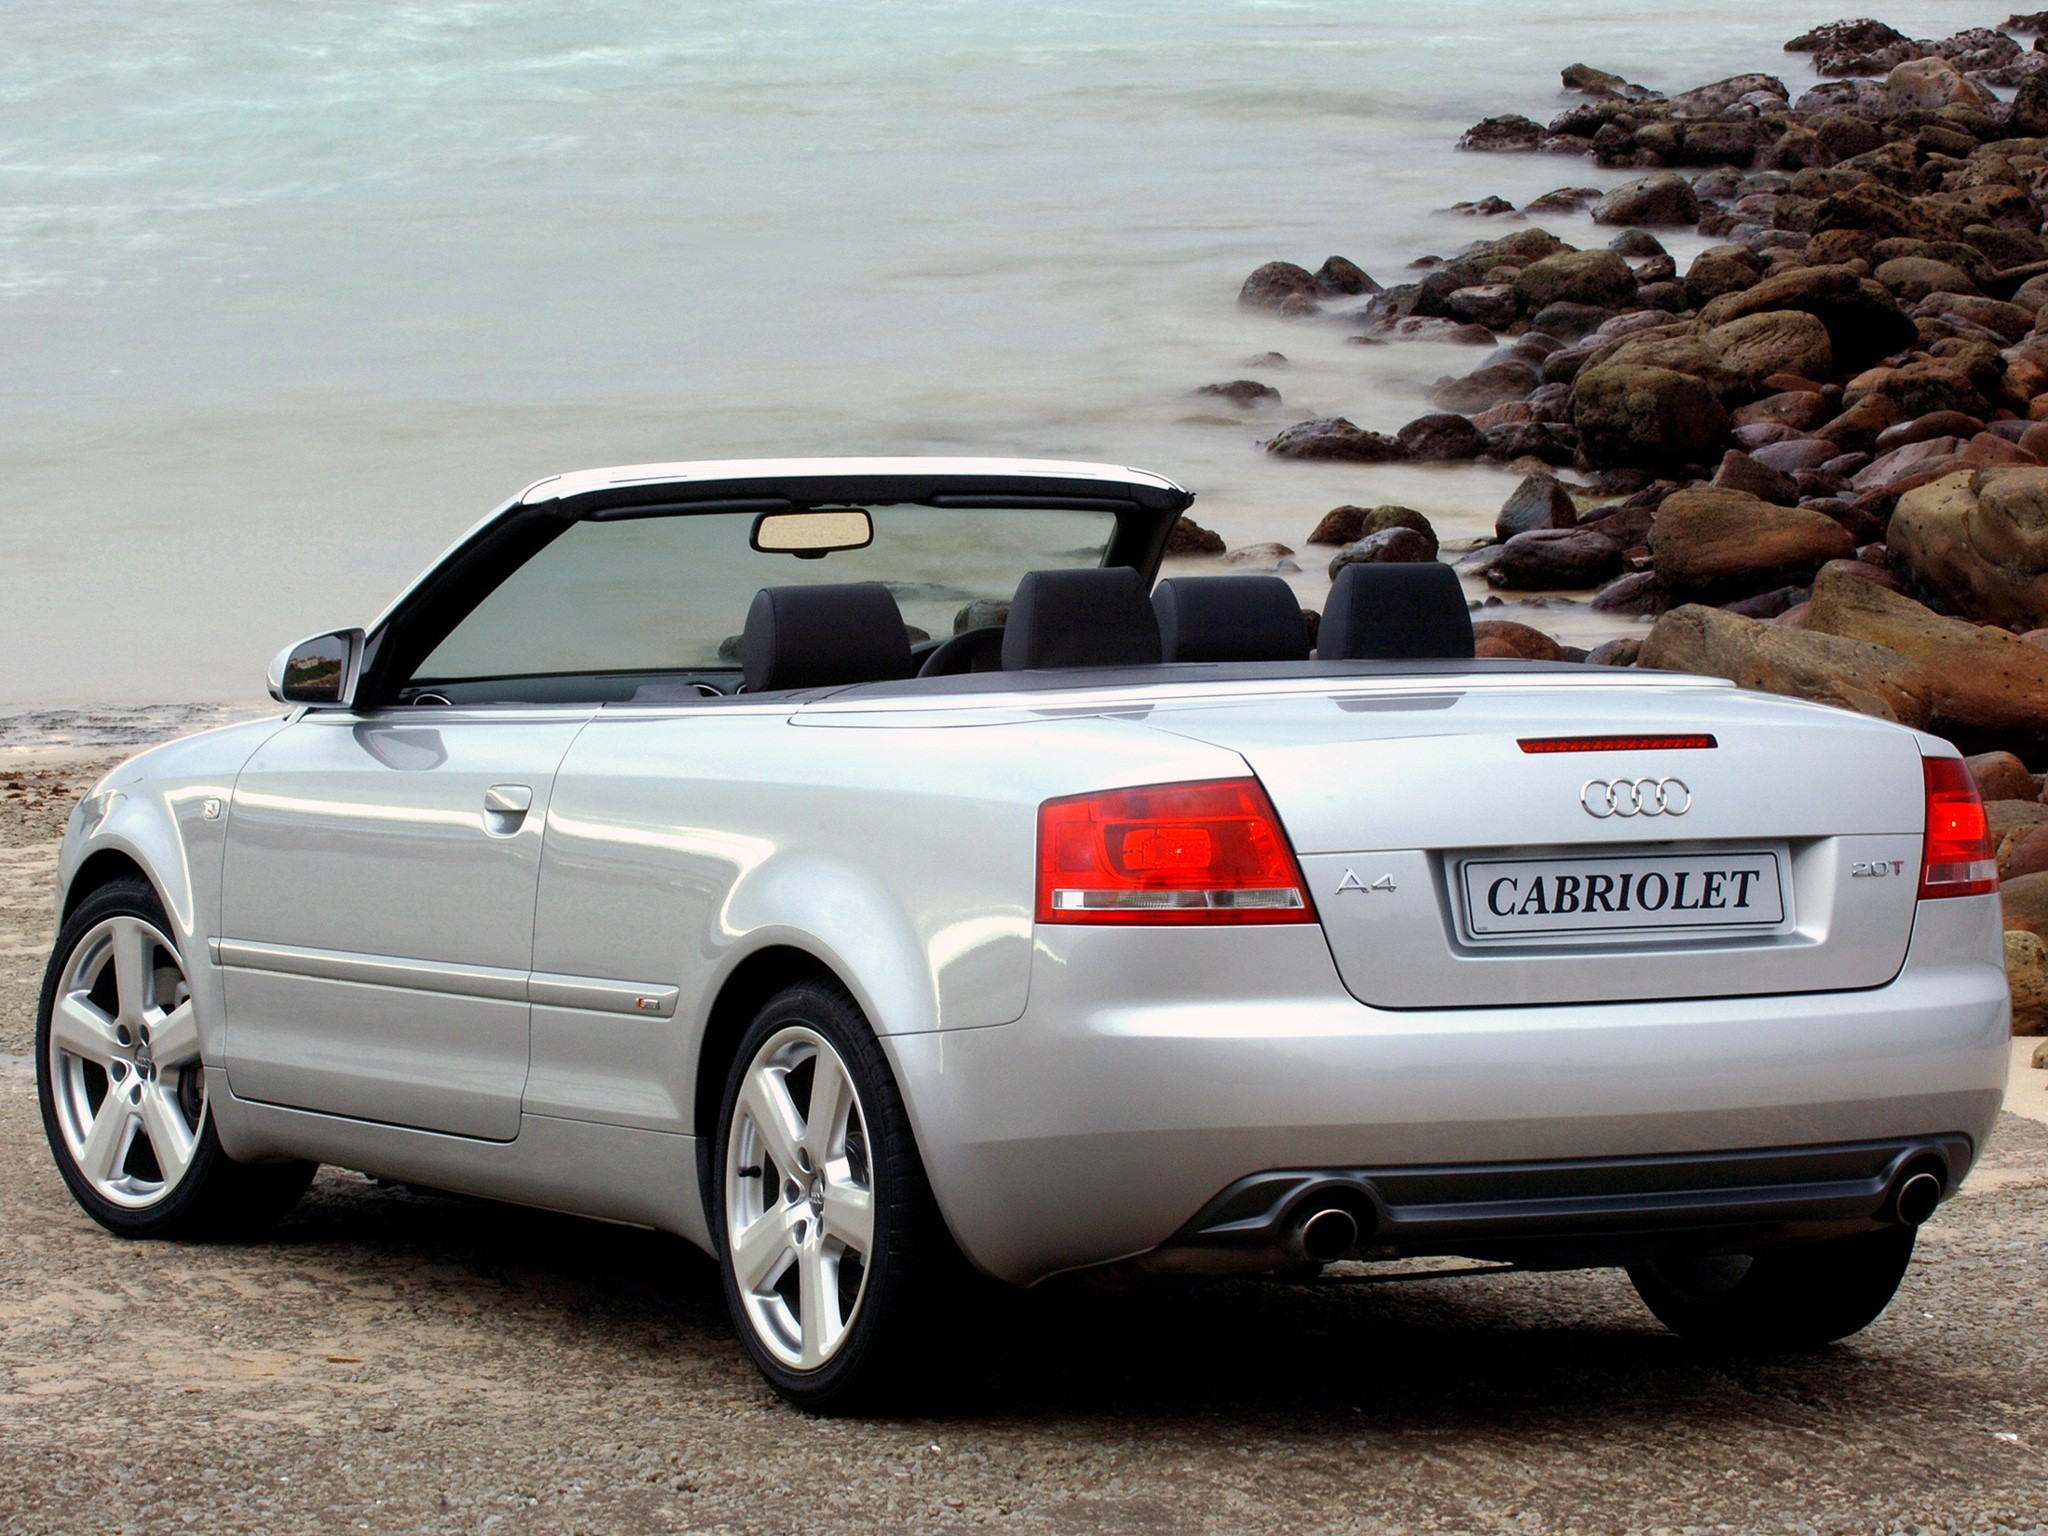 Audi S4 III (B7) 2005 - 2008 Cabriolet #6